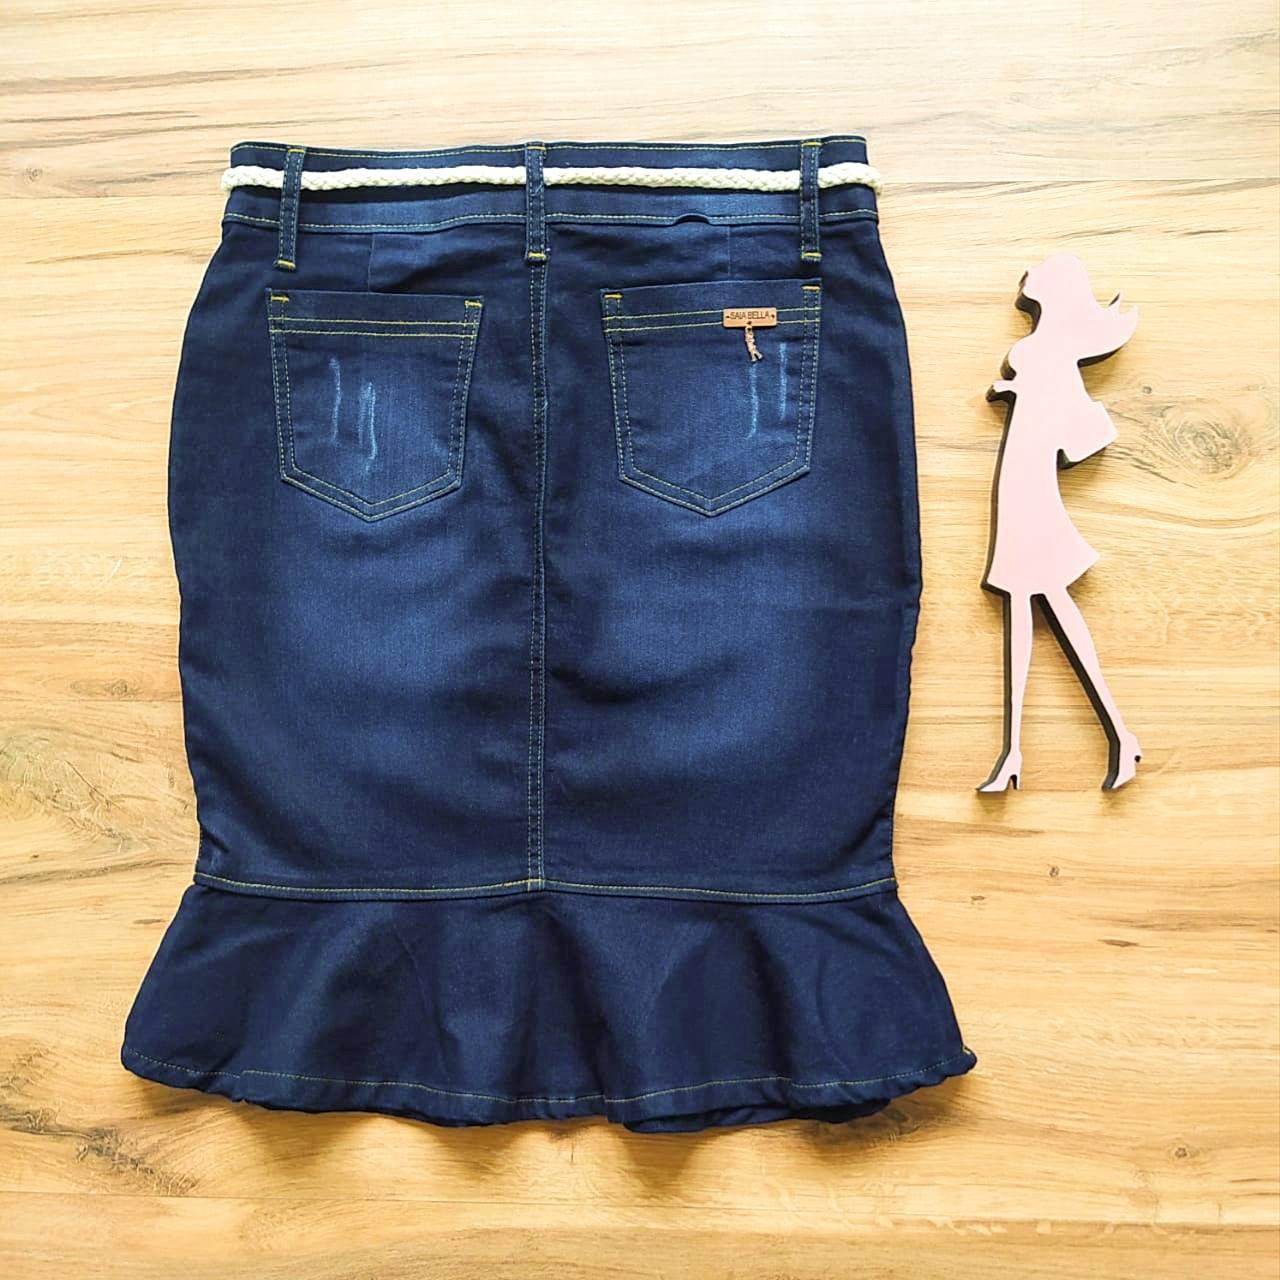 Saia Jeans Laura SB126 - Azul Escuro